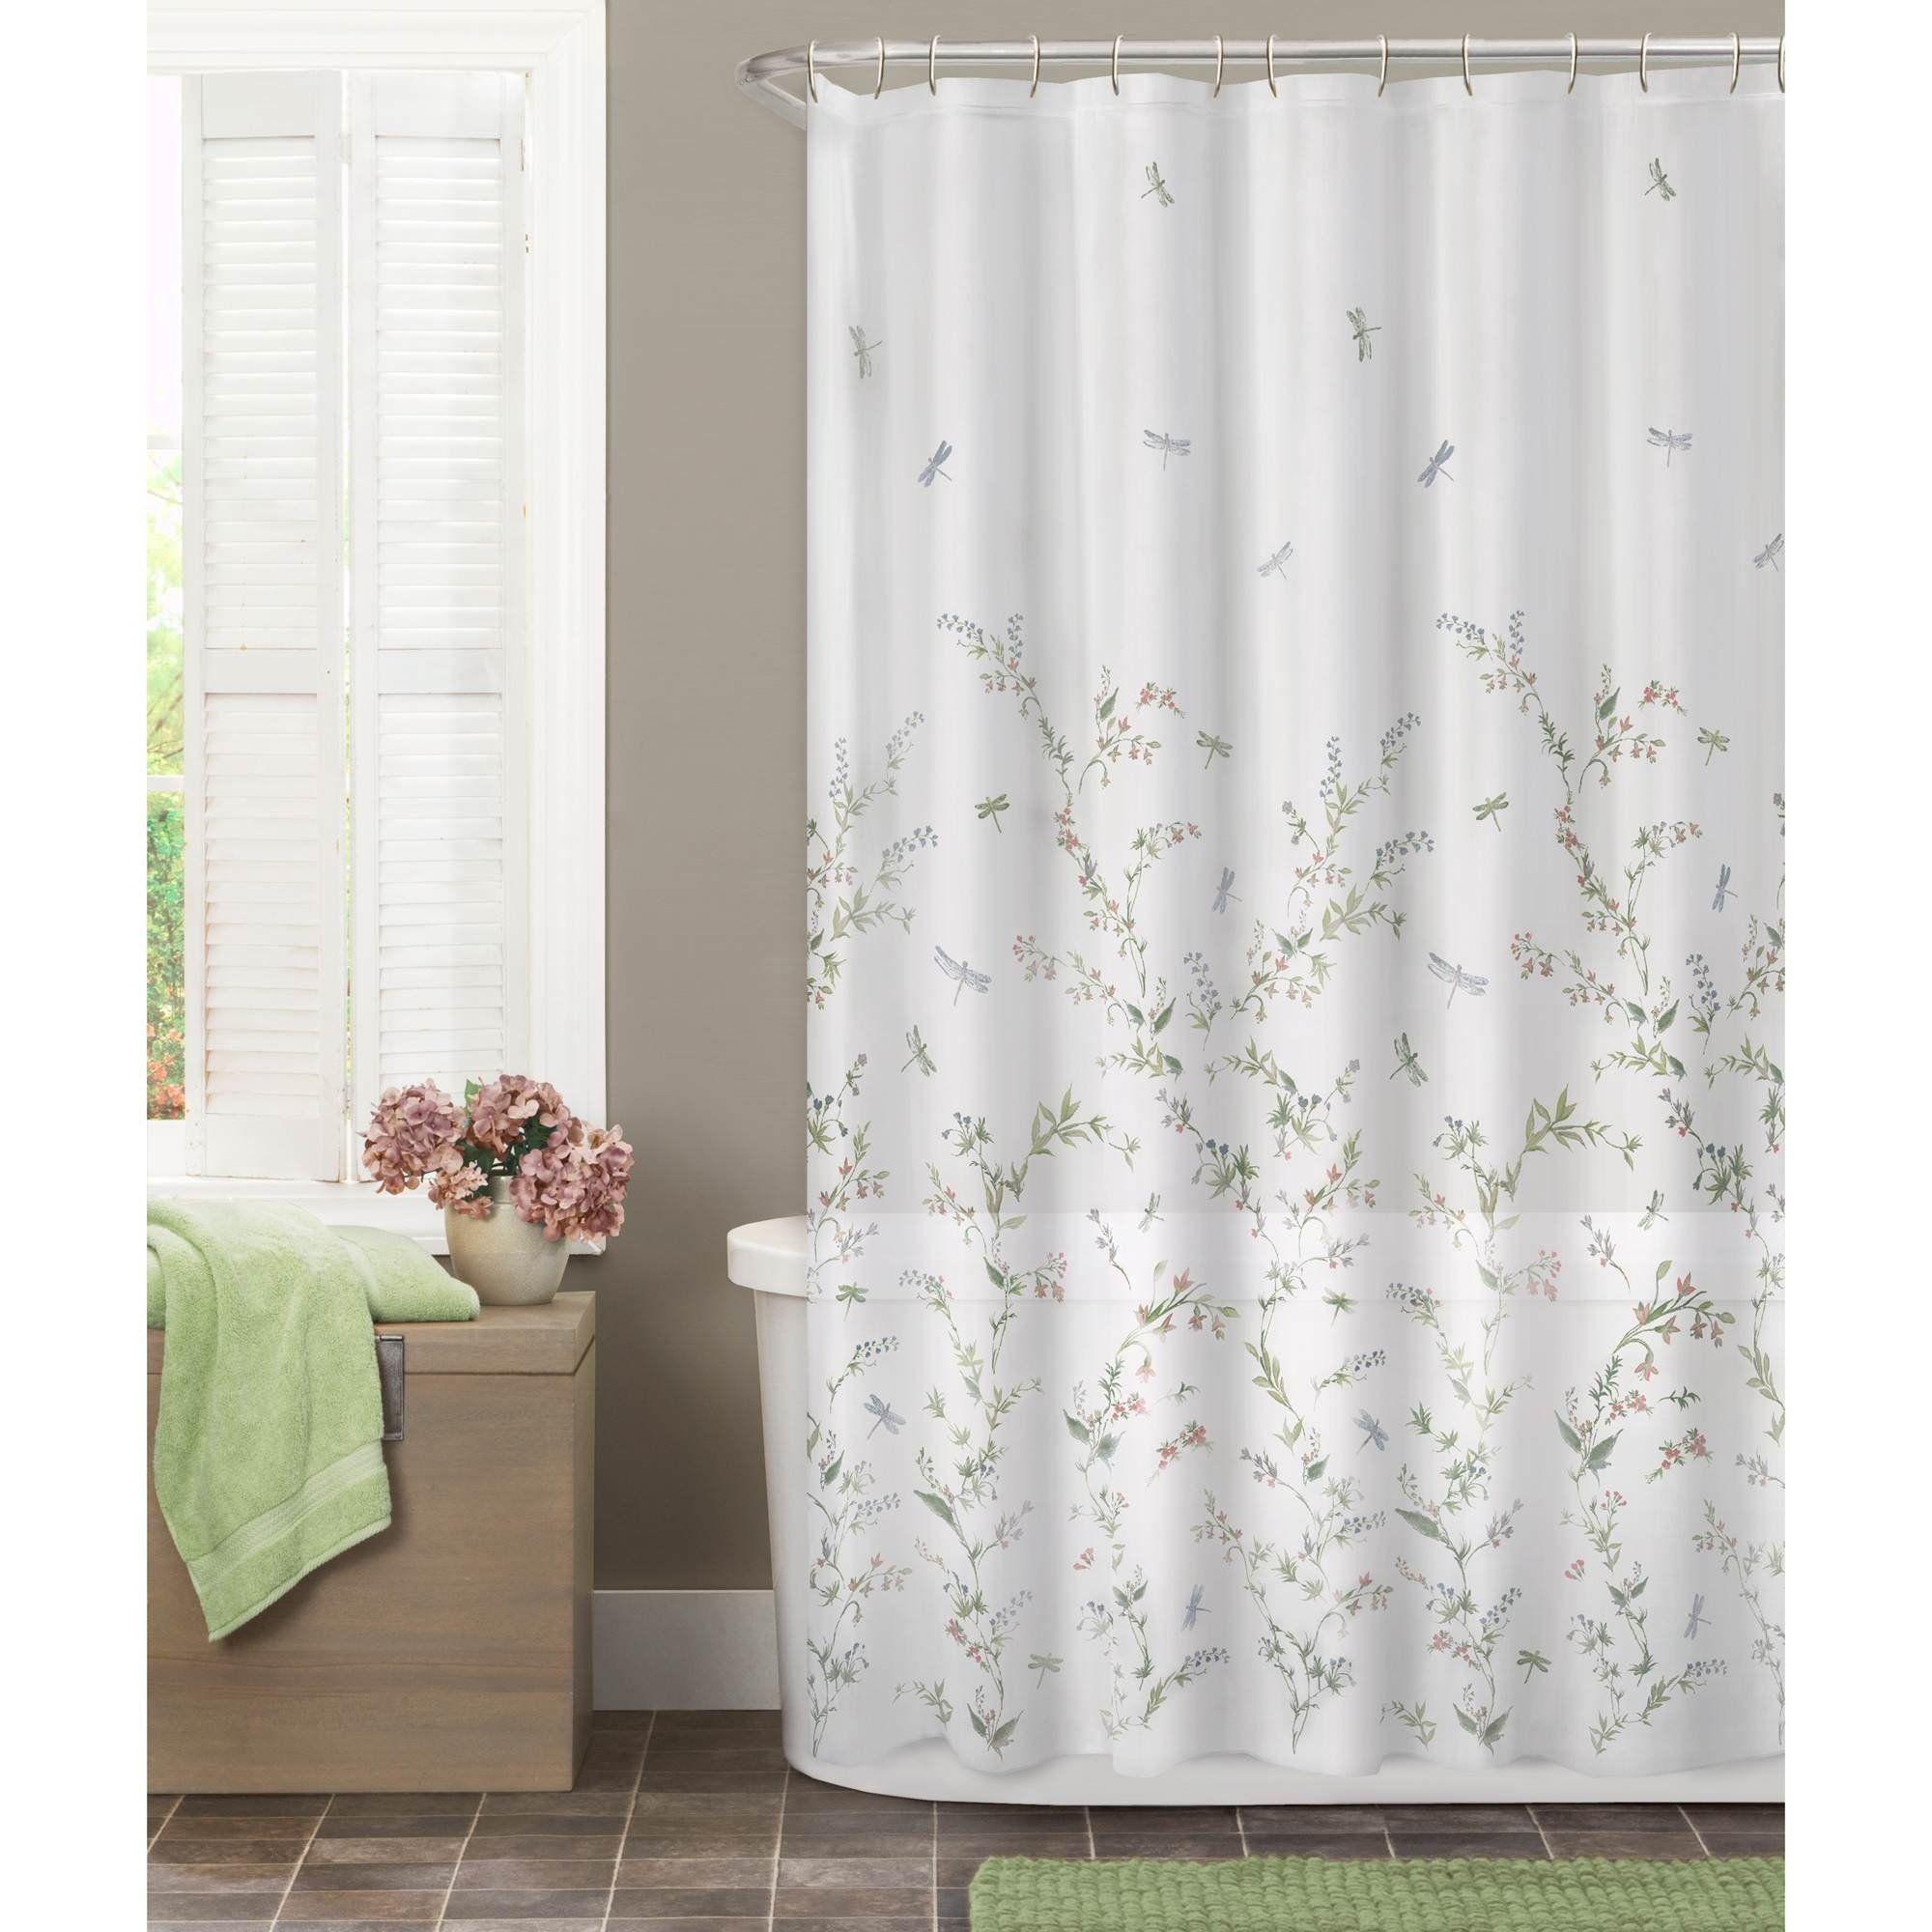 Maytex Dragonfly Garden Fabric Semi Sheer Shower Curtain Multi